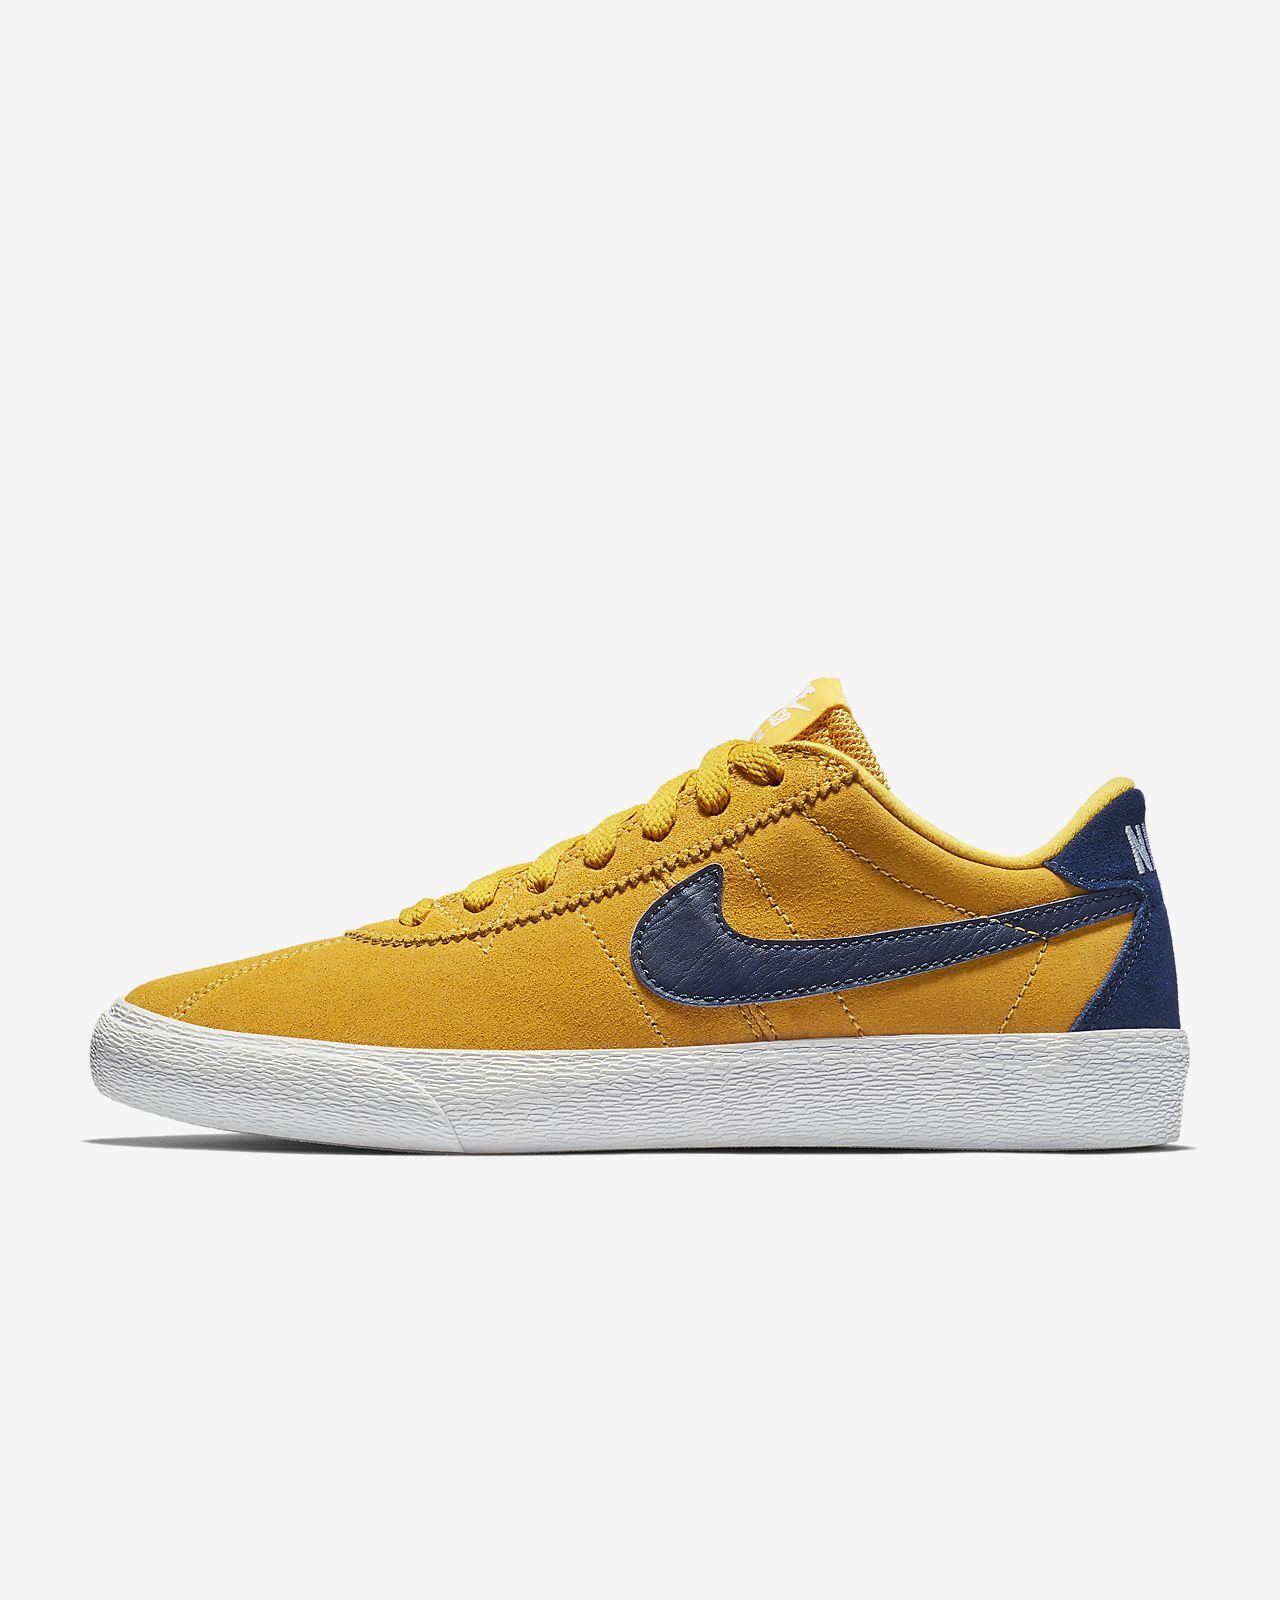 Nike SB Bruin Low Damen Skateboardschuh Verhandeln